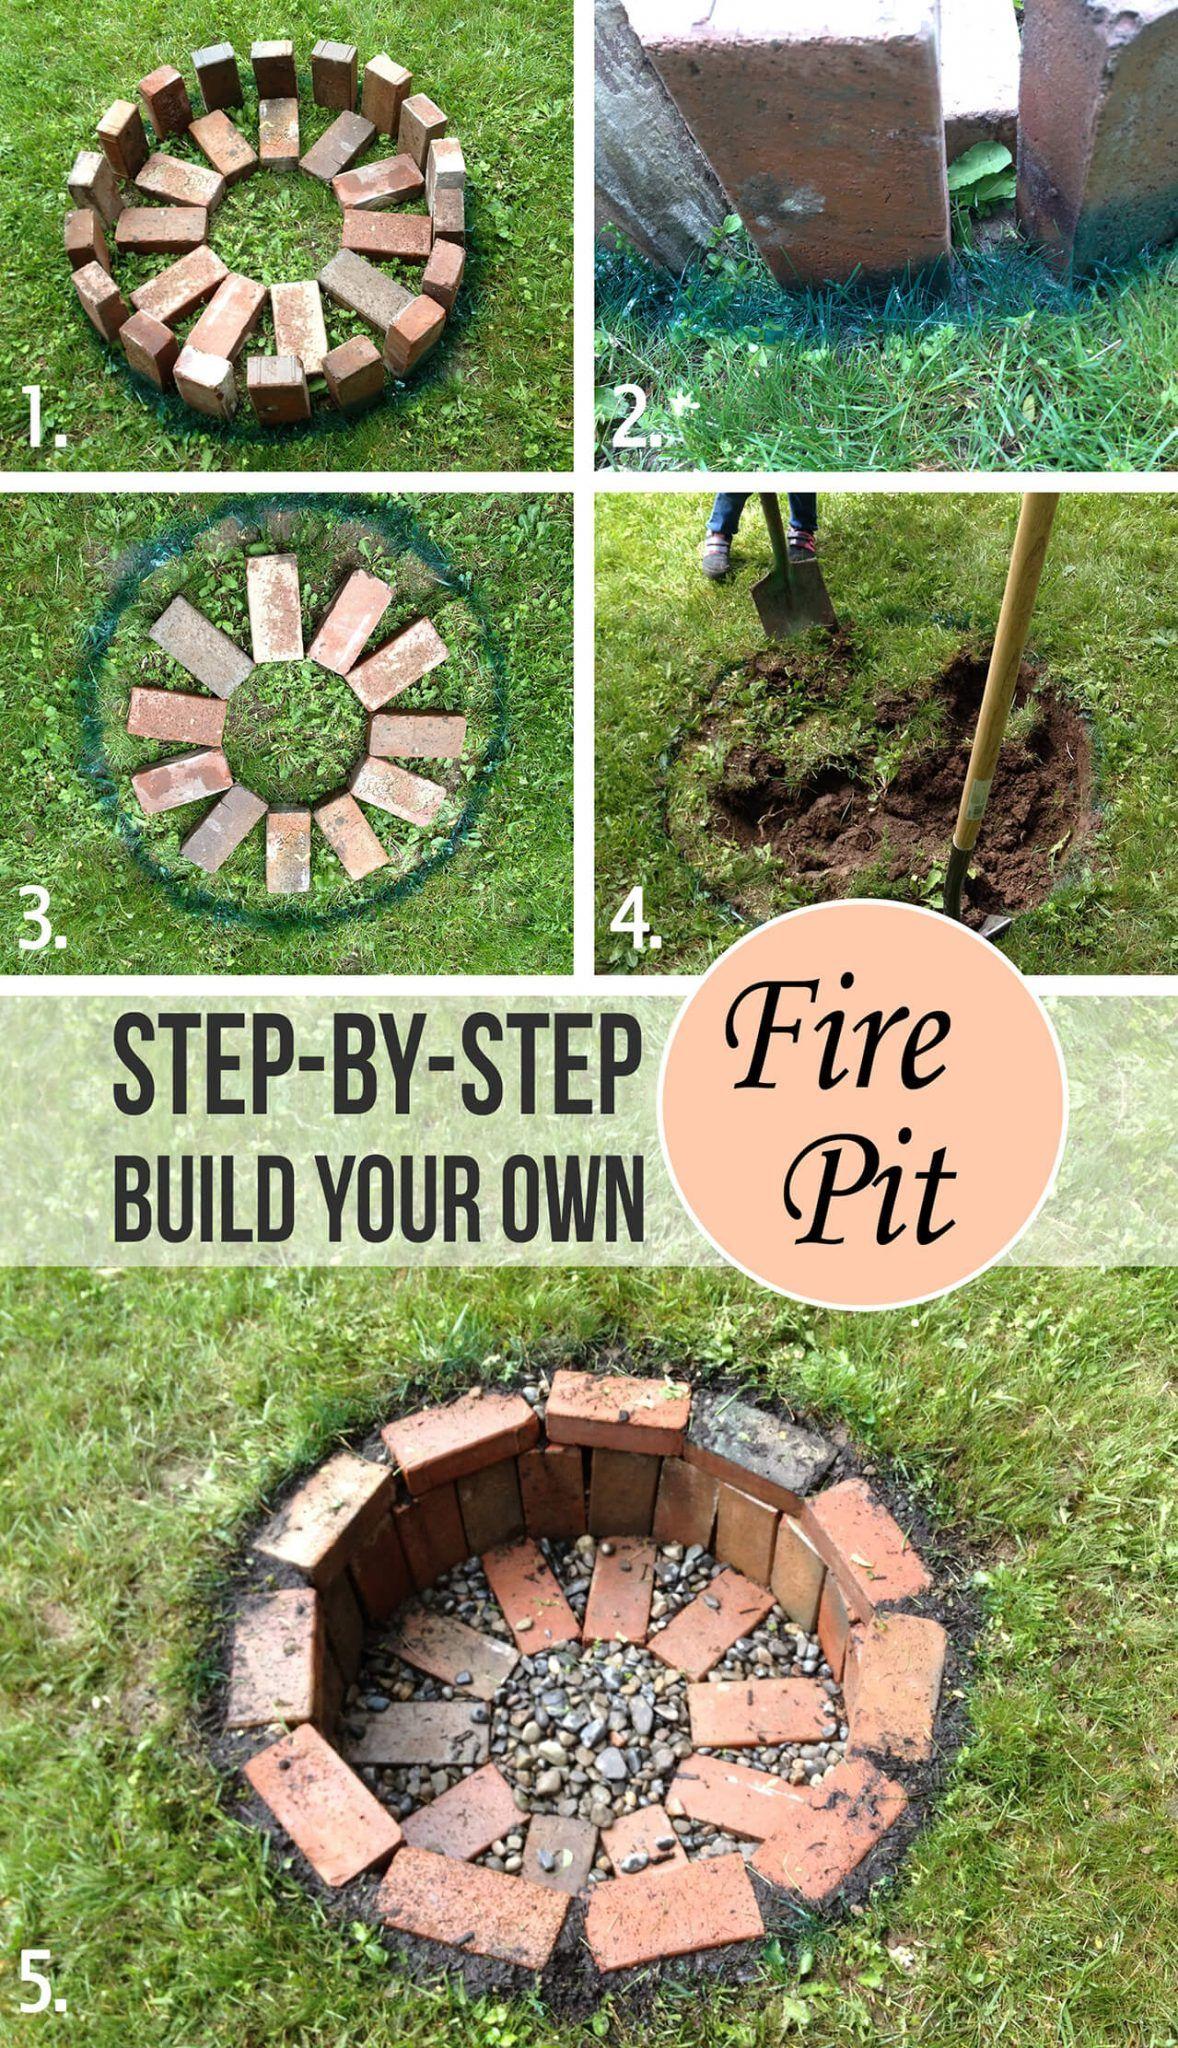 DIY Round Brick Firepit Tutorial Barbecue Jardin, Brasero, Idee Deco Jardin,  Décoration Maison d6db5ec3a513